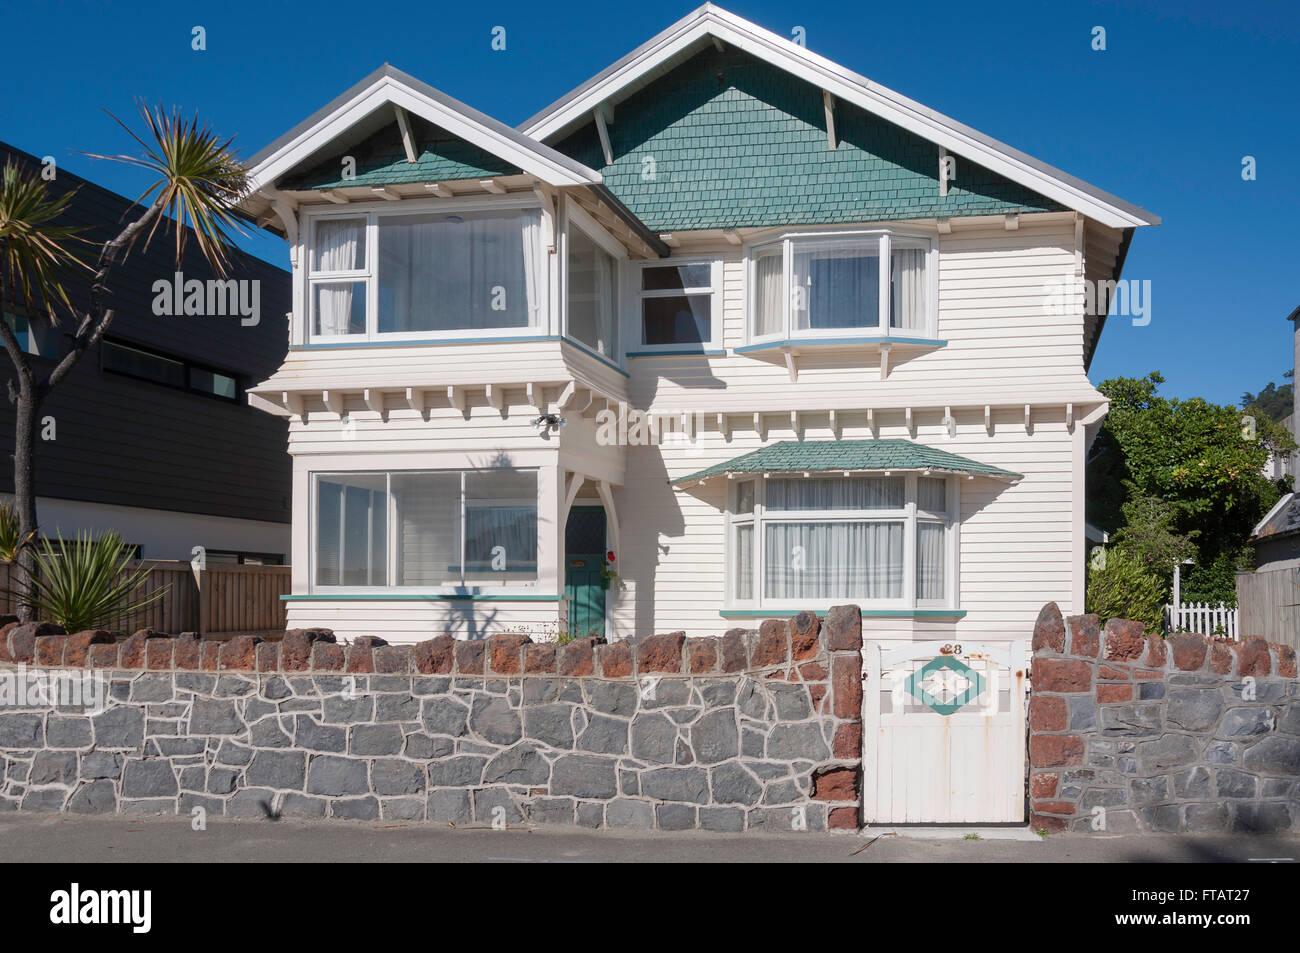 Edwardian seafront house, Esplanade, Sumner, Christchurch, Canterbury Region, South Island, New Zealand Stock Photo